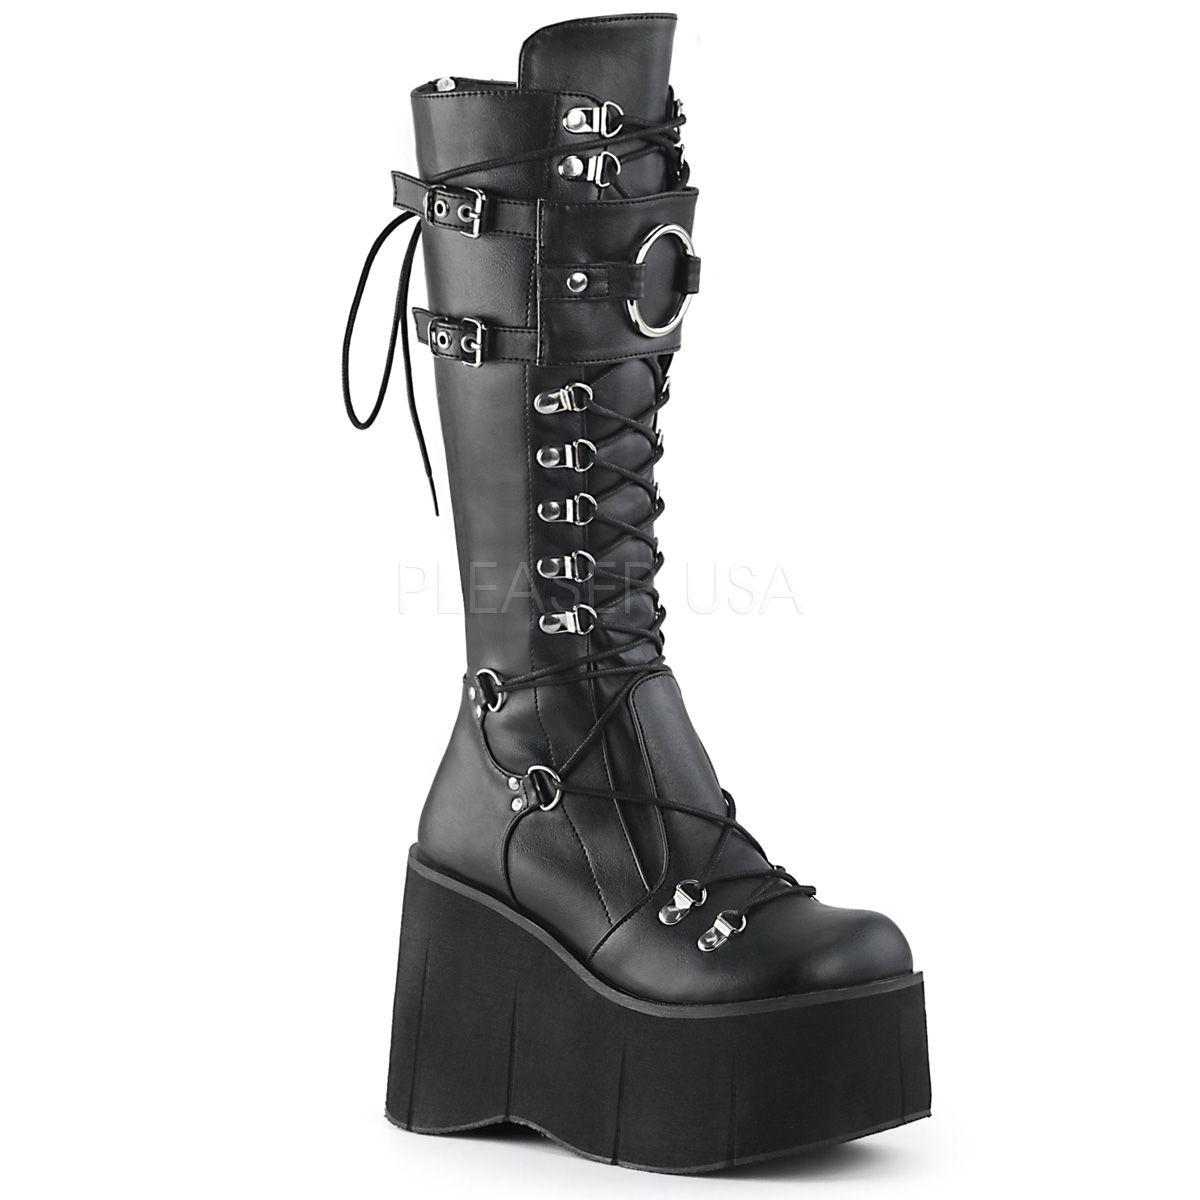 Botas DEMONIA estilo gótico punk de plataforma acordonadas con argollas